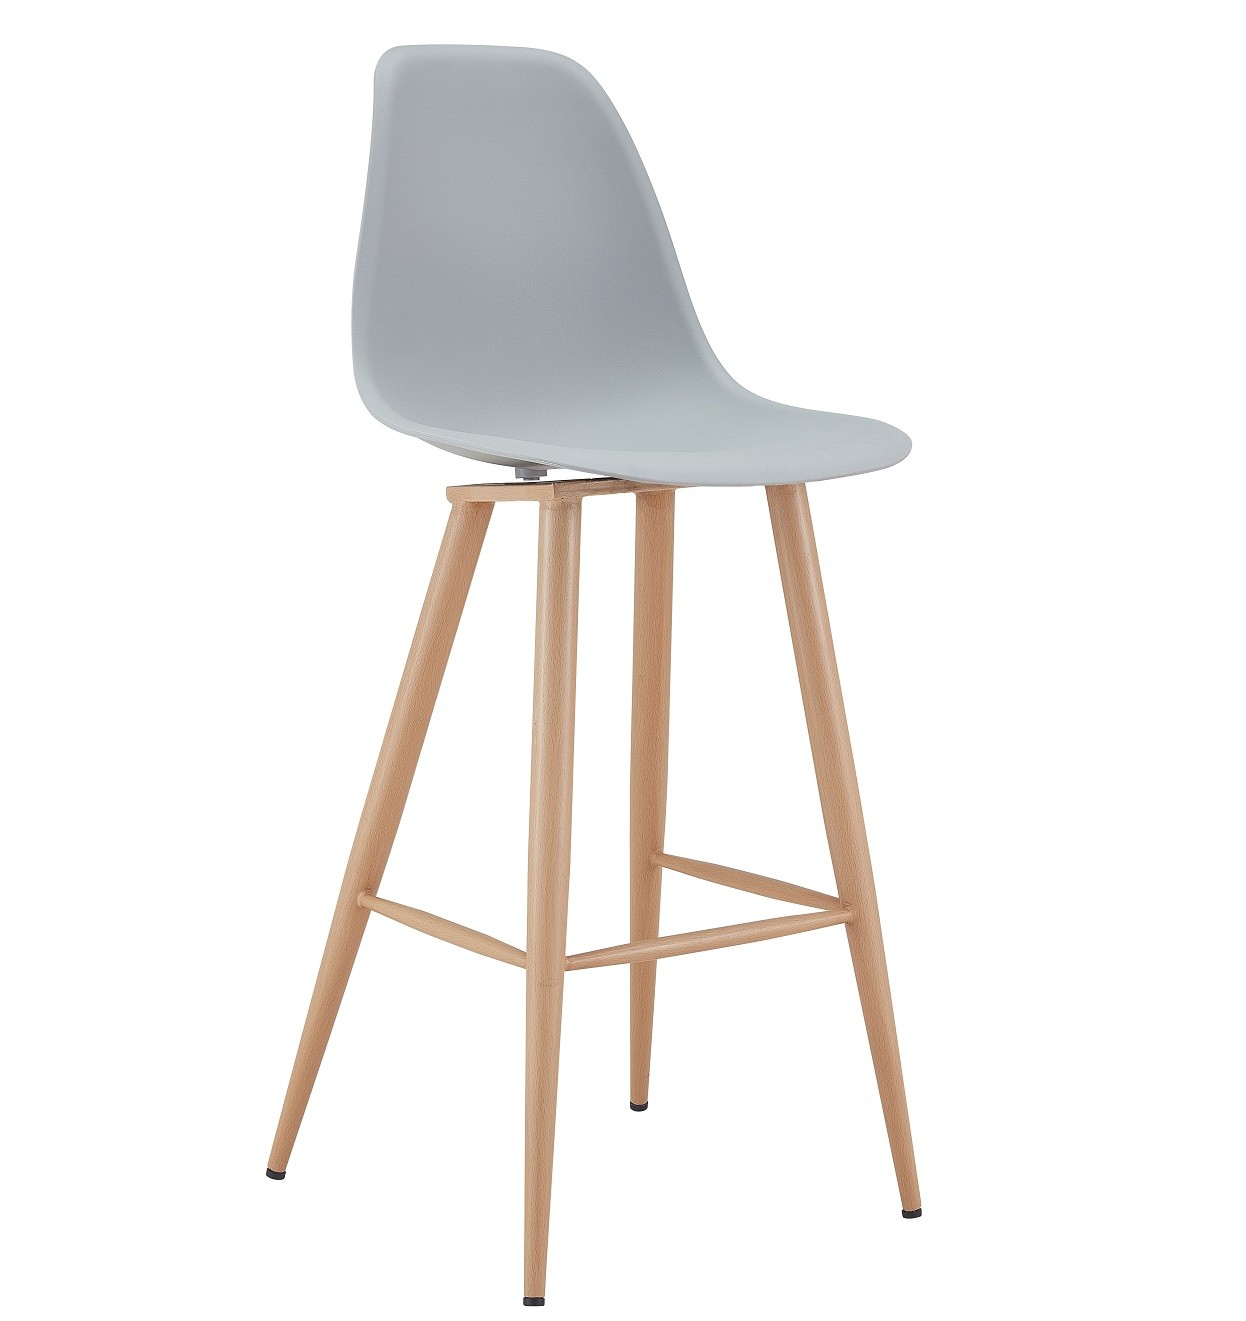 Stool CLUNY, Metal Wood Color, Polypropylene Gray